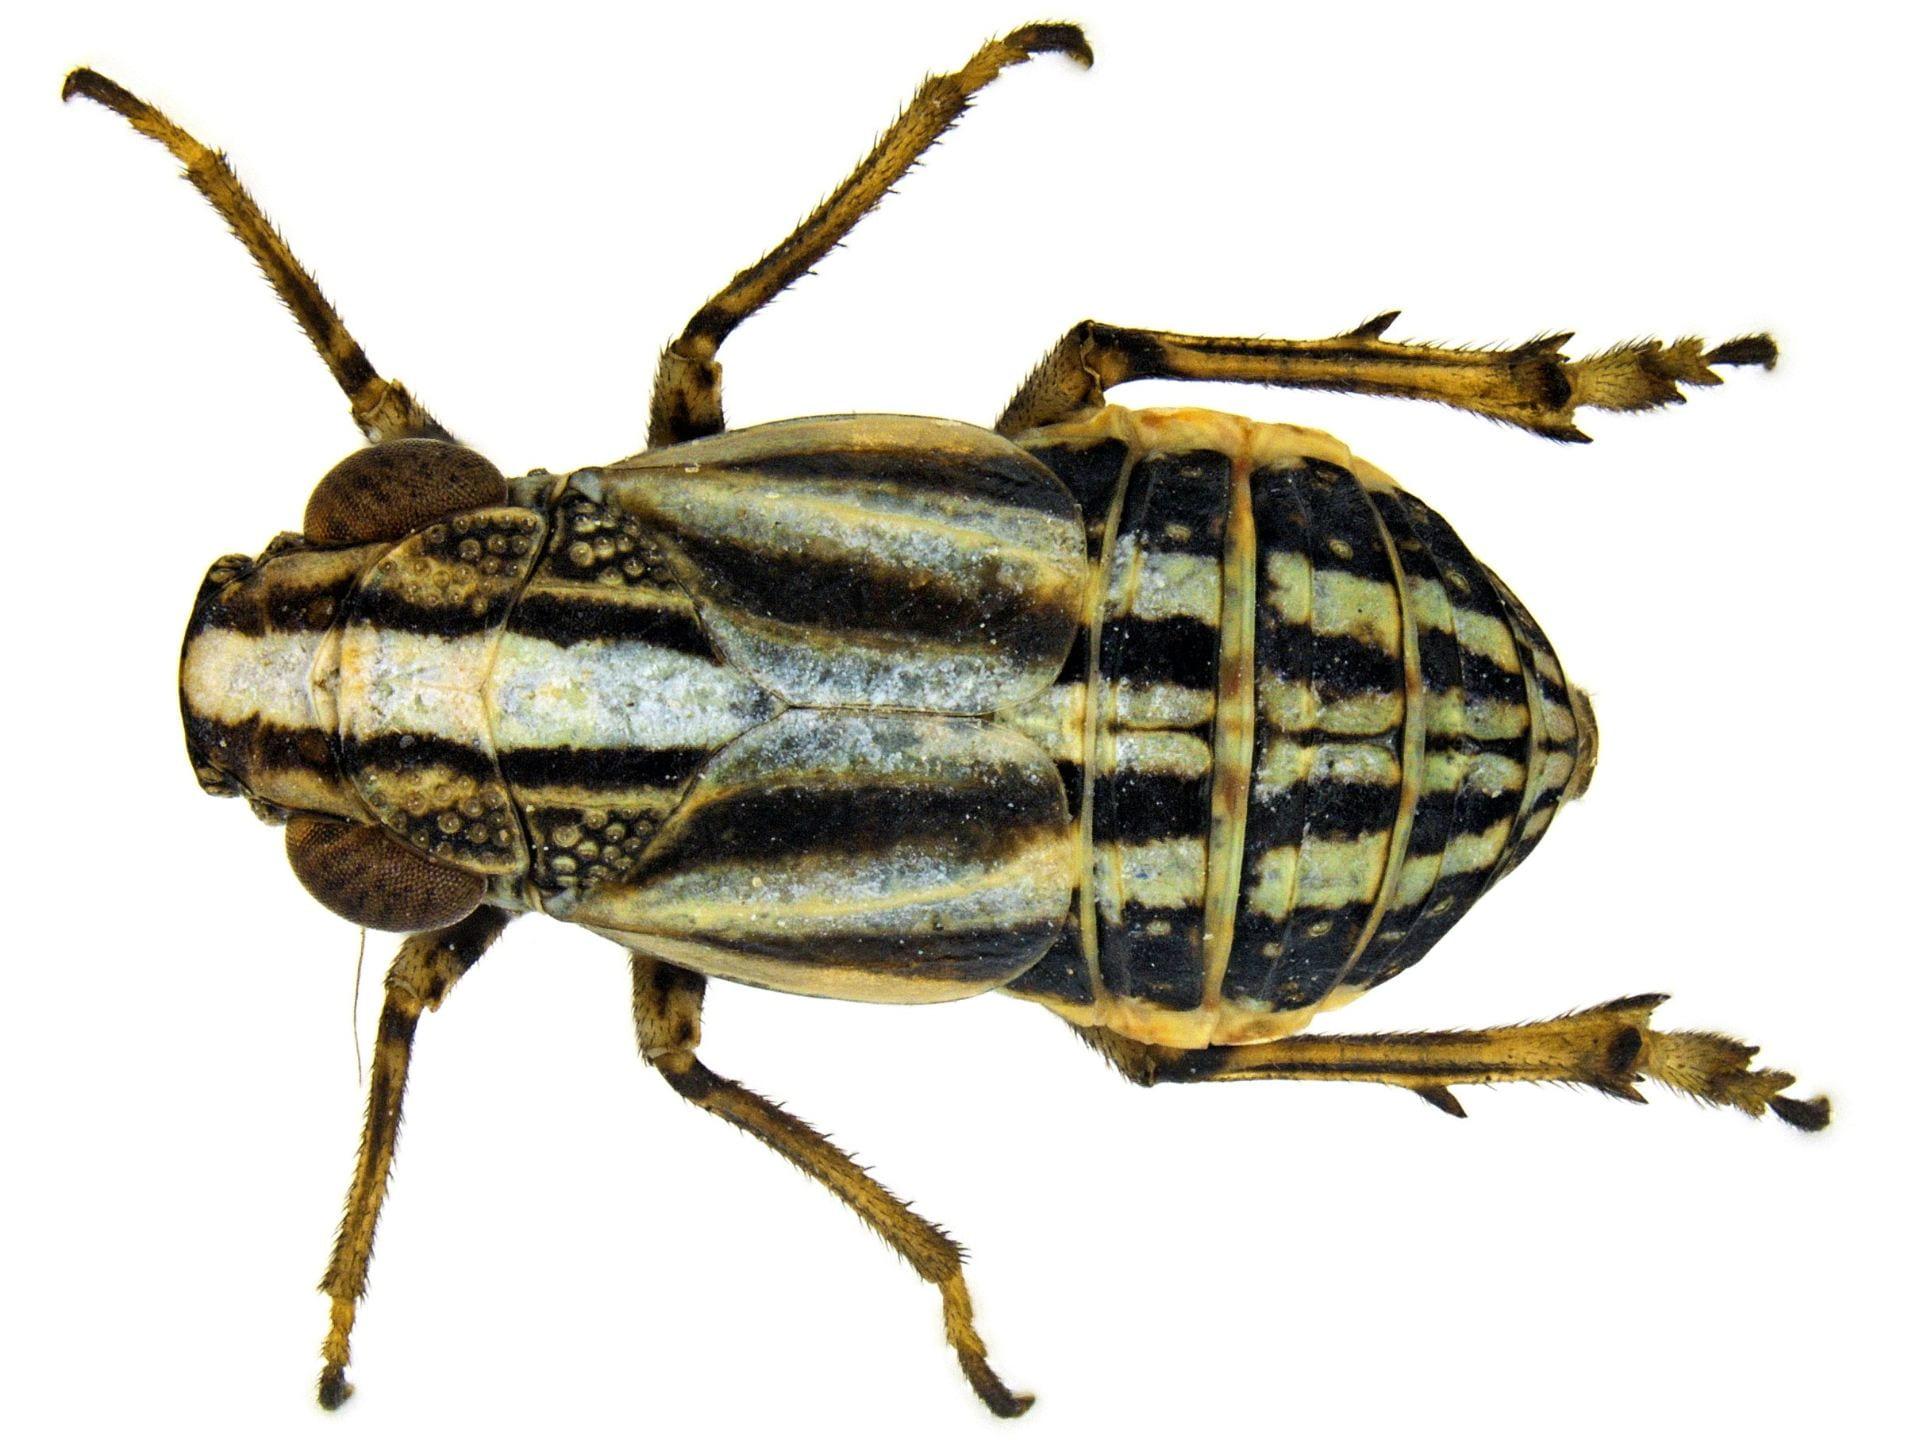 Aphelonema histrionica